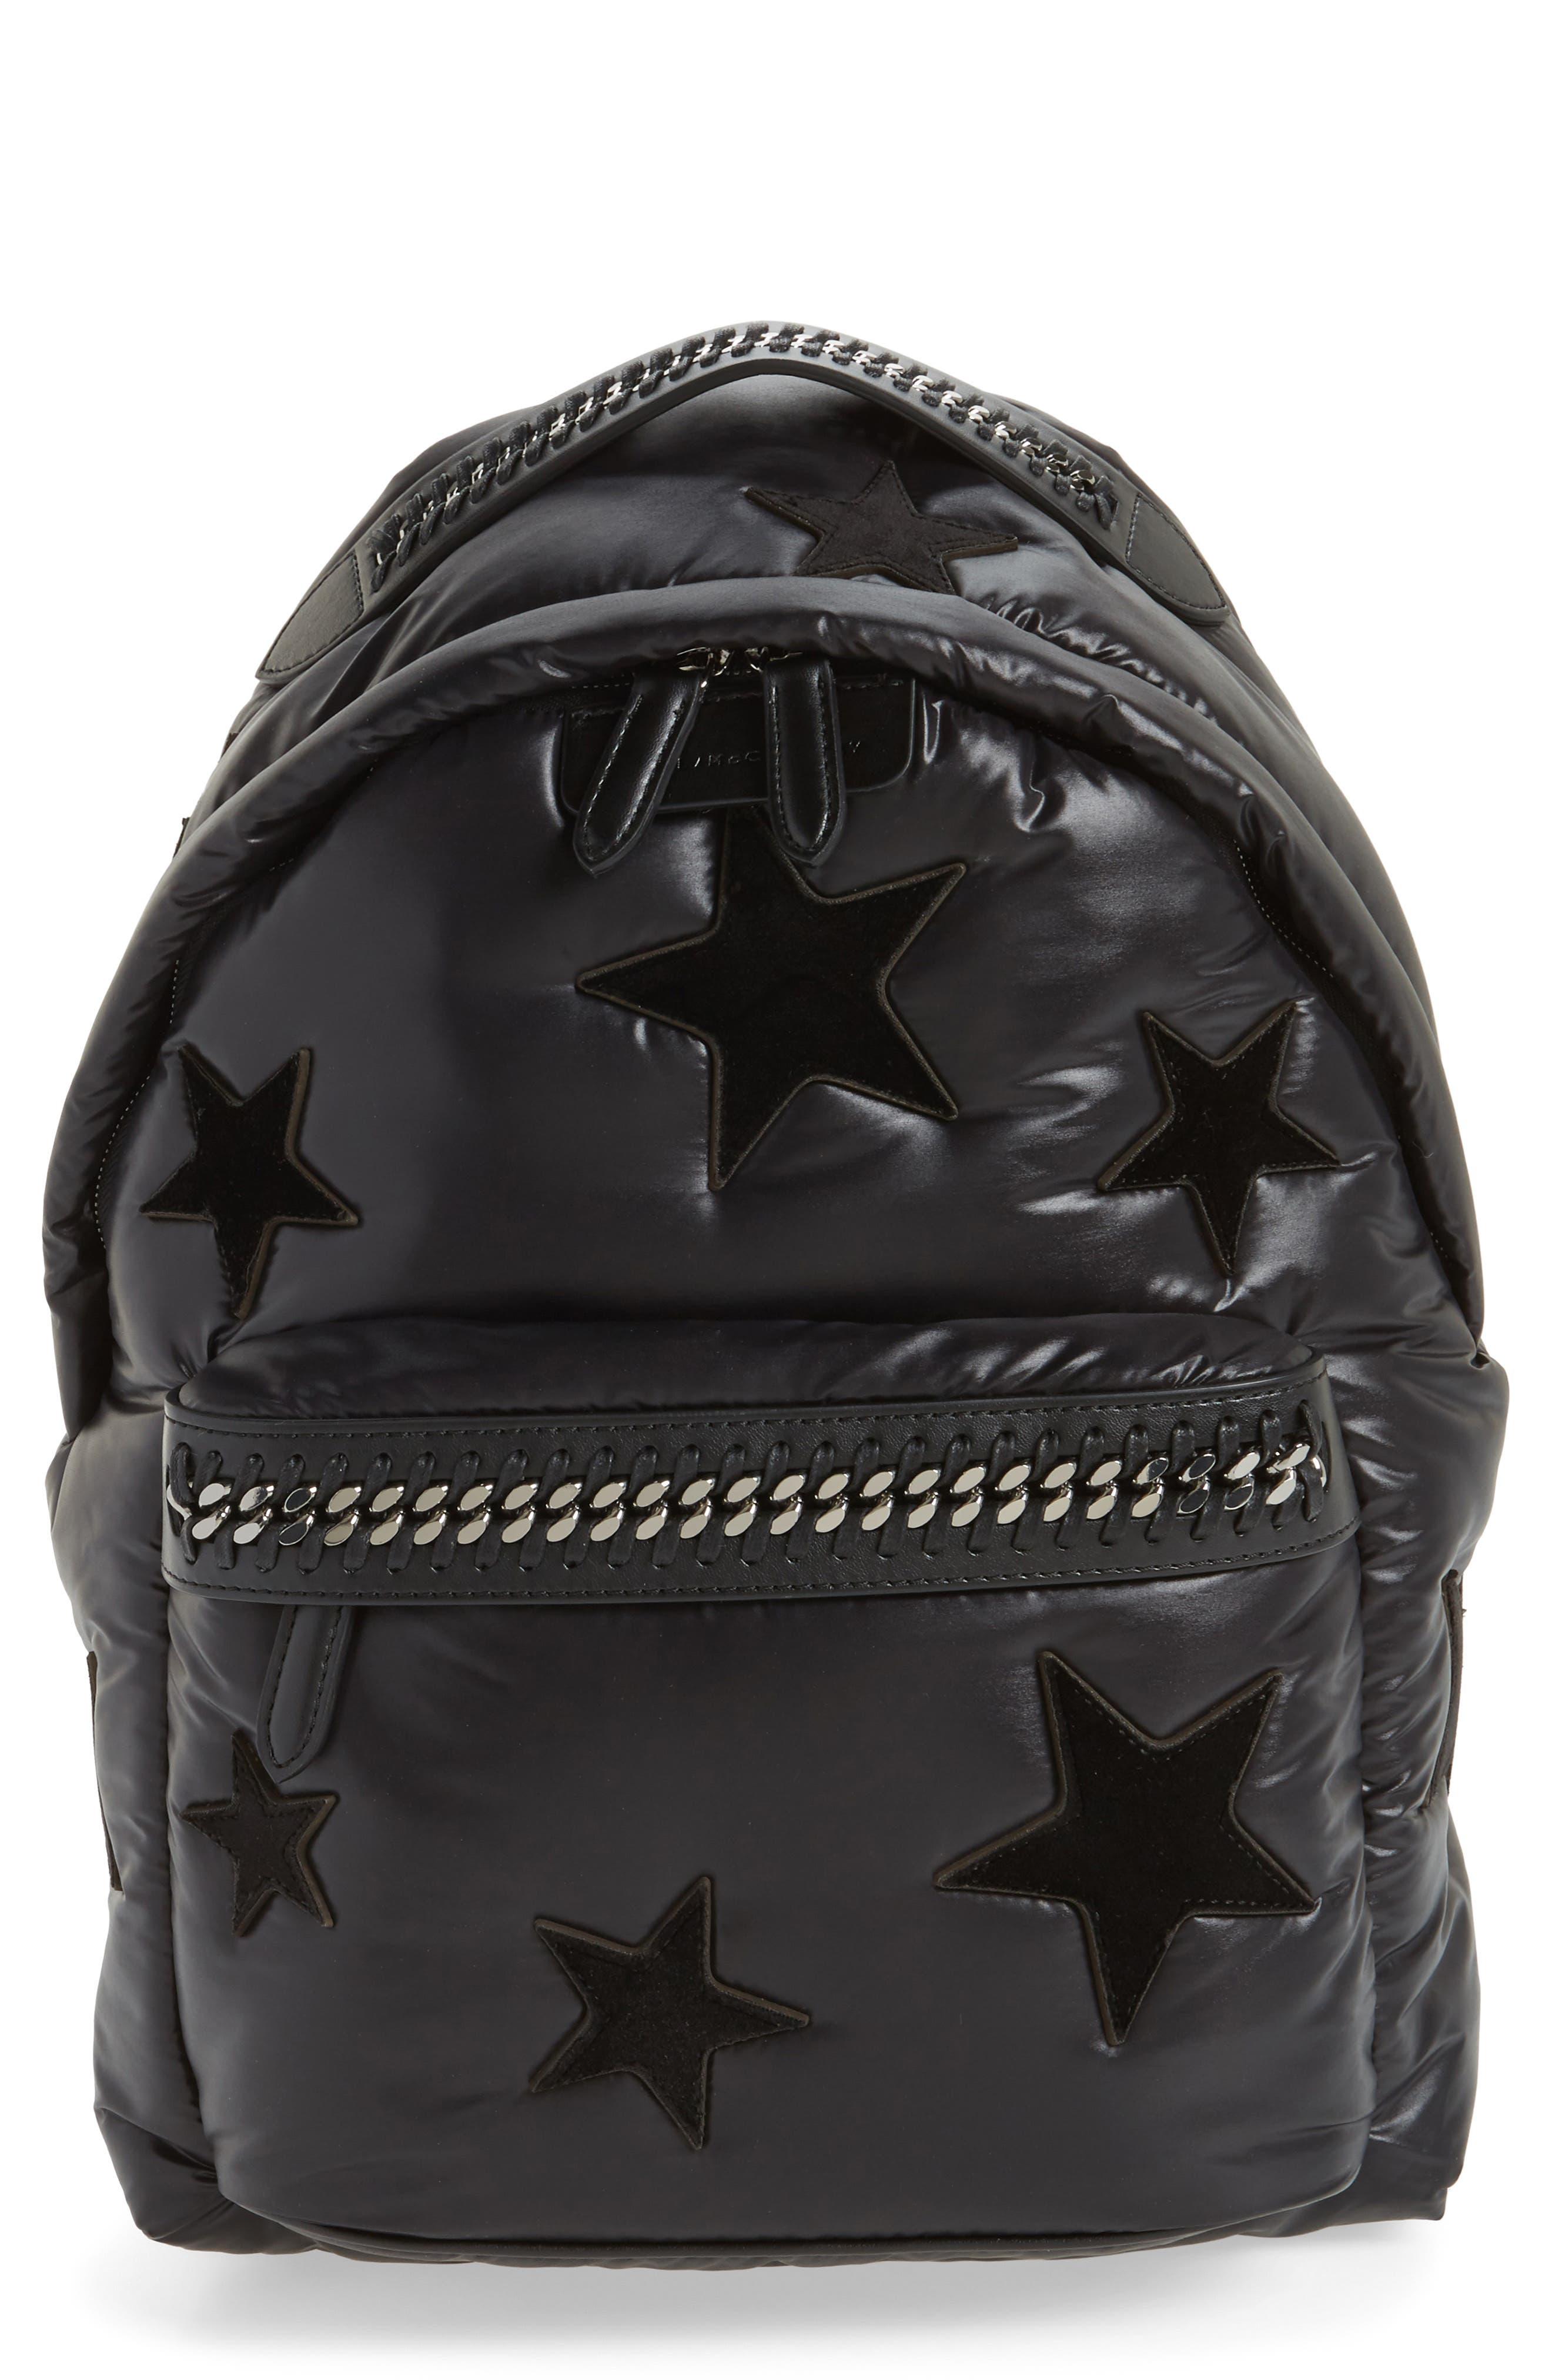 Alternate Image 1 Selected - Stella McCartney Falabella Go All Over Stars Backpack